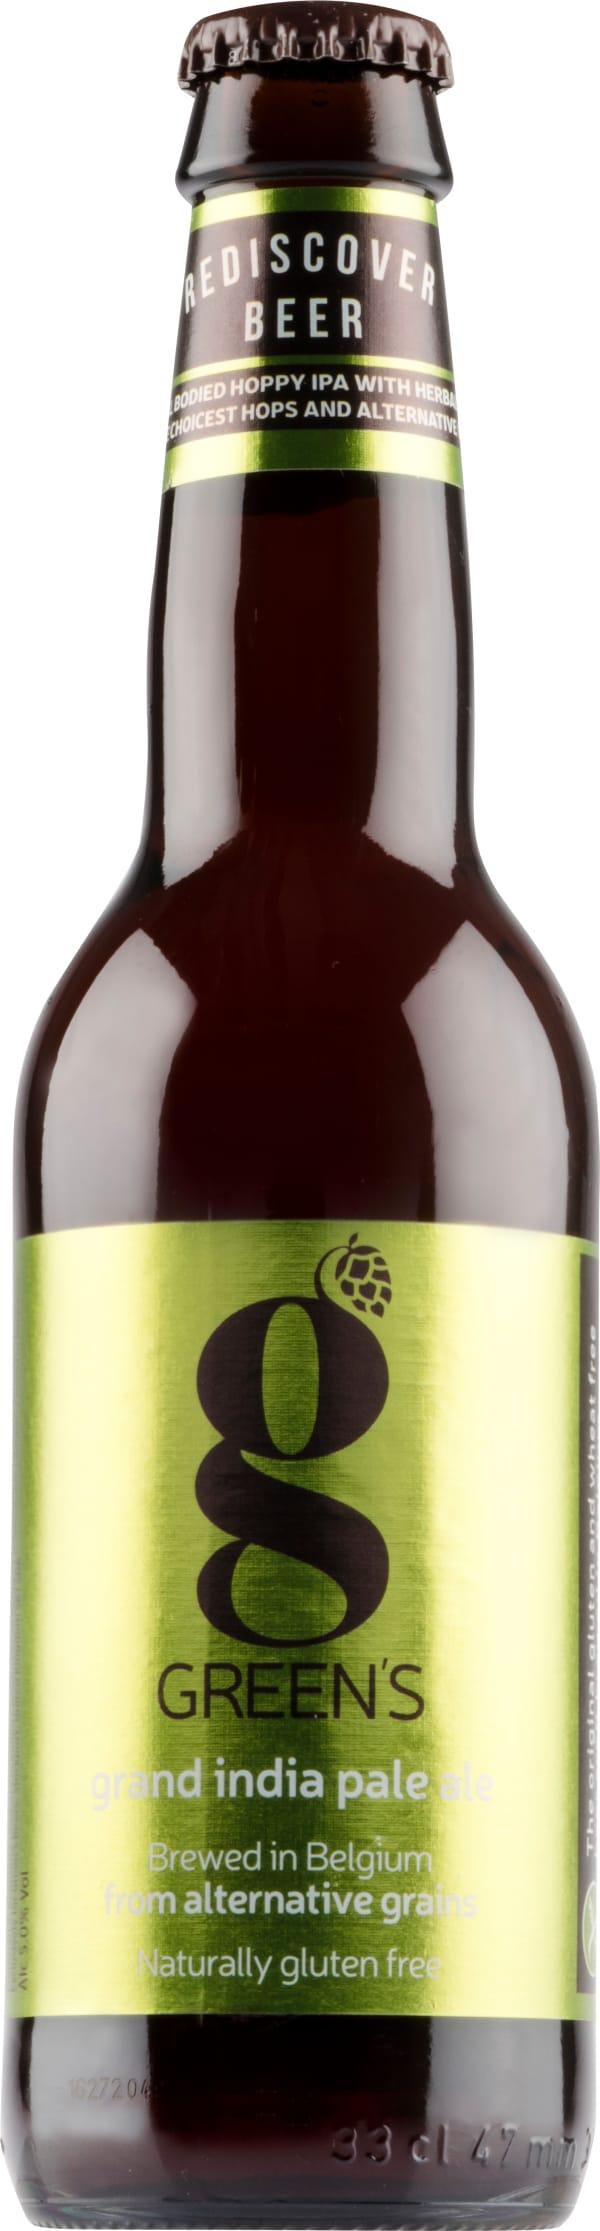 Green's Grand India Pale Ale